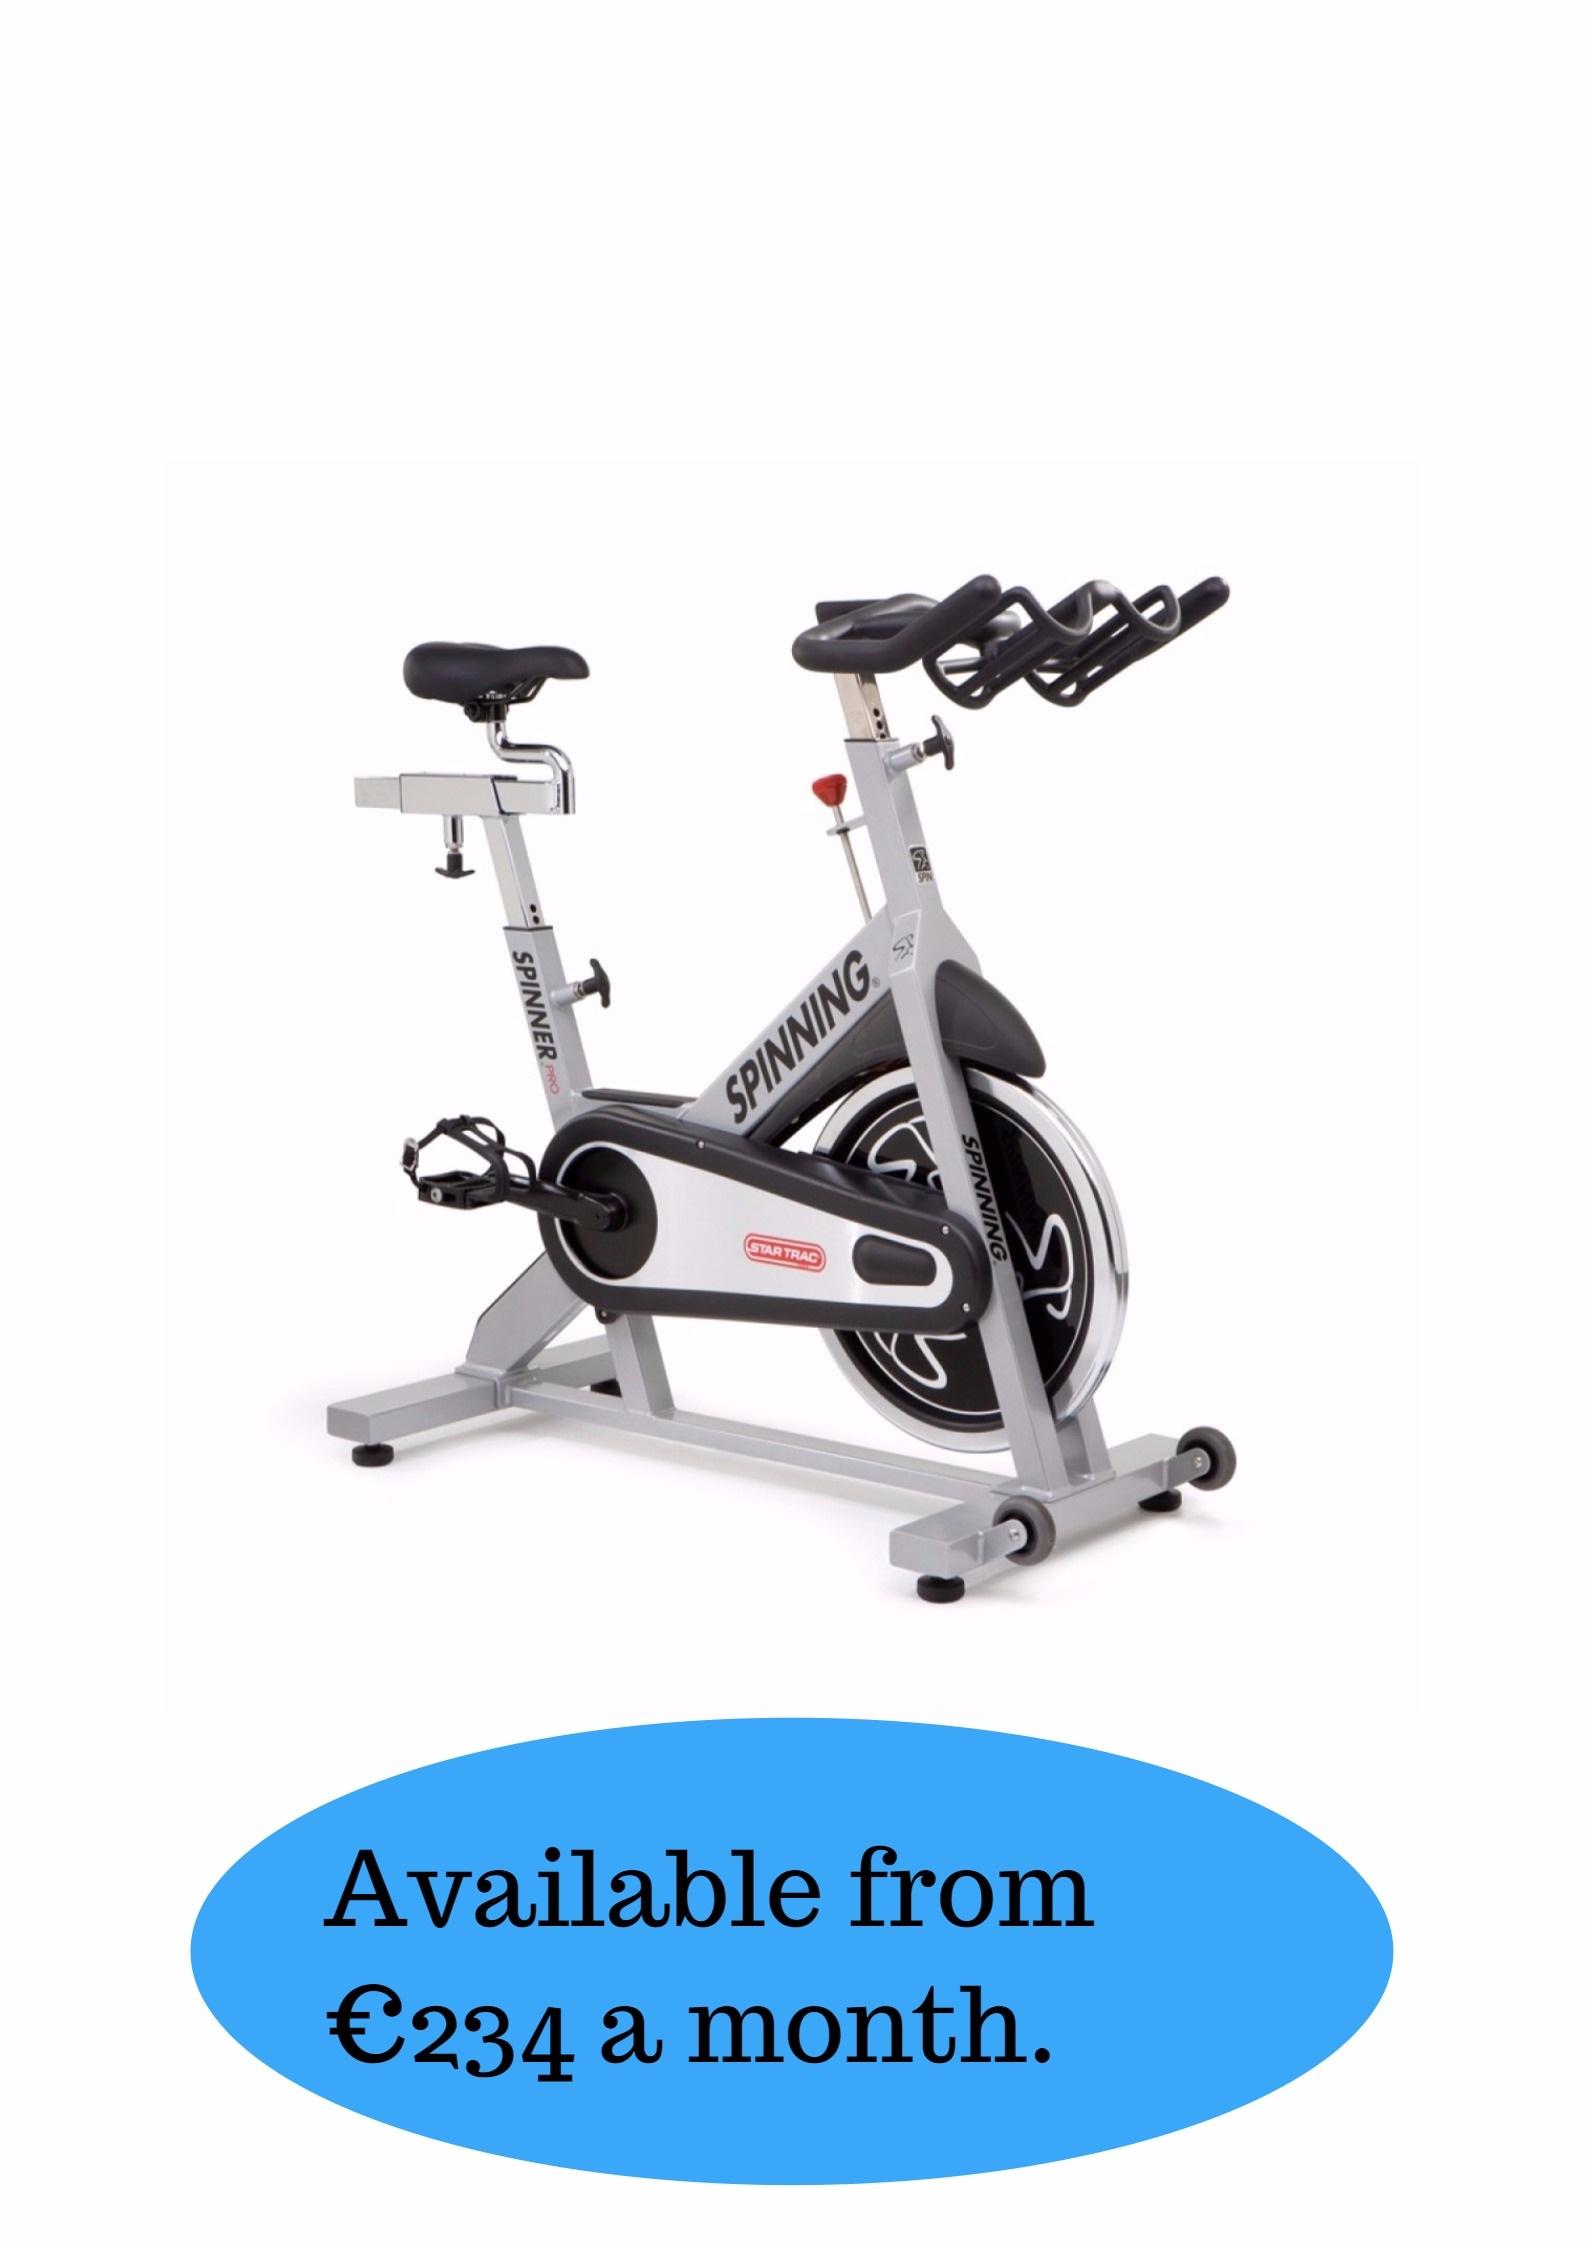 0b2554648a7 10 x Star Trac Pro Spin Bikes - Fitness Equipment Ireland